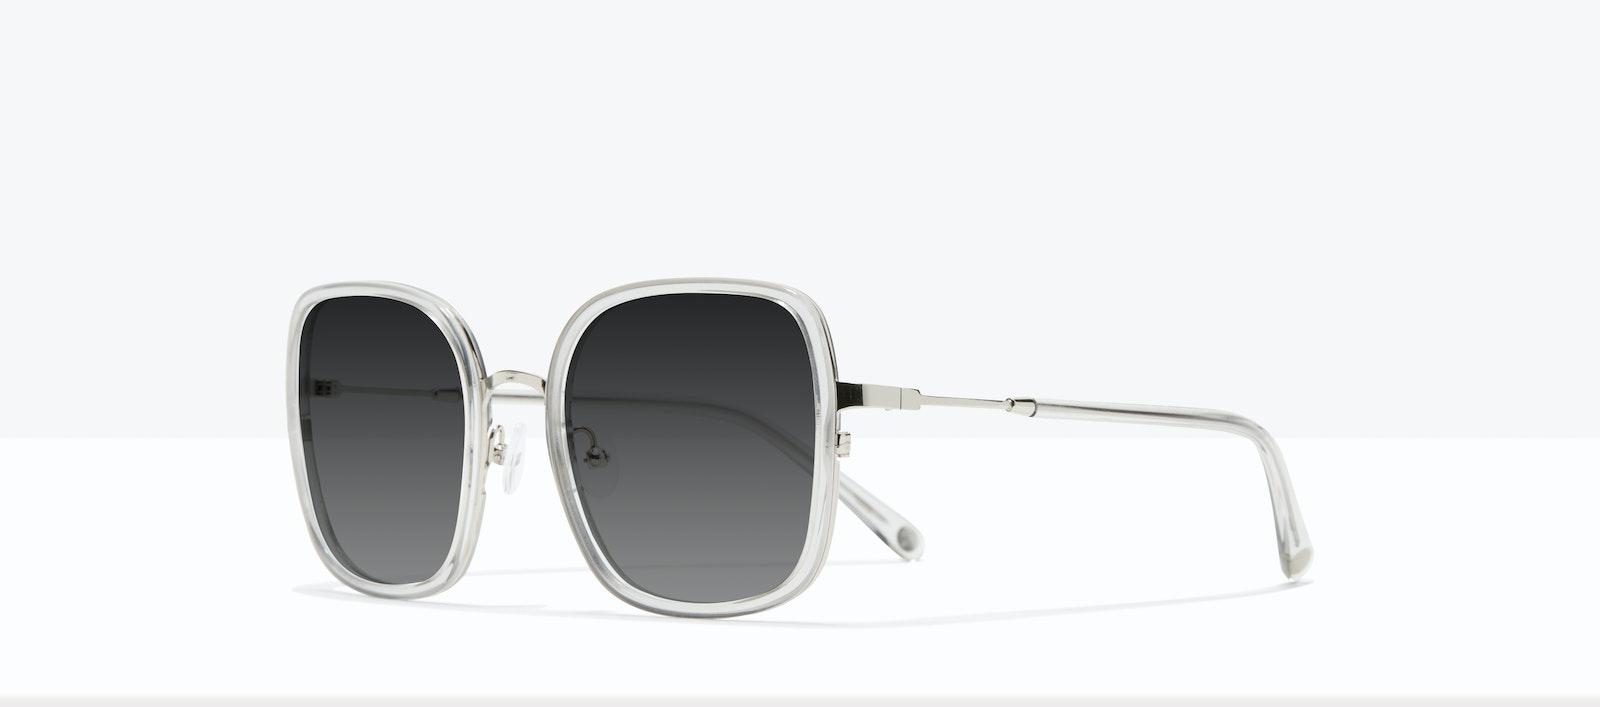 Affordable Fashion Glasses Square Sunglasses Women Geraldine M Taupe Tilt